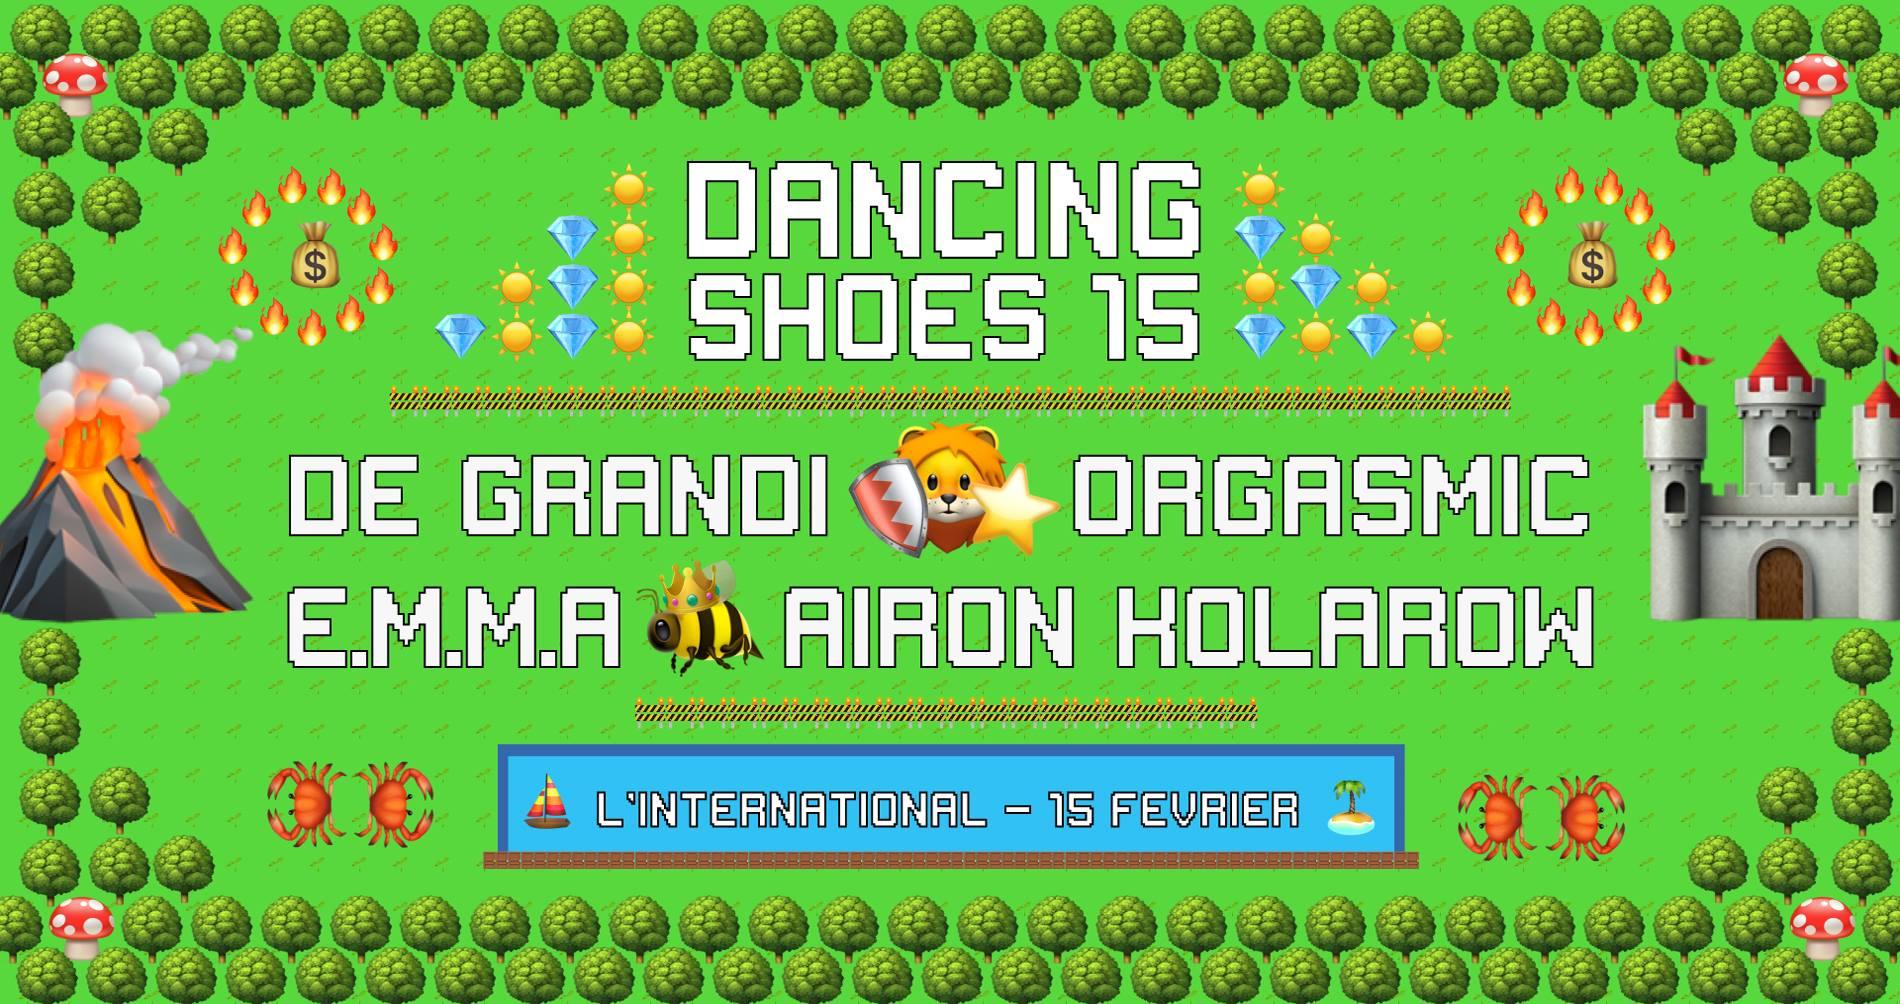 dancing shoes orgasmic de grandi emma airon kolarow couvre x chefs